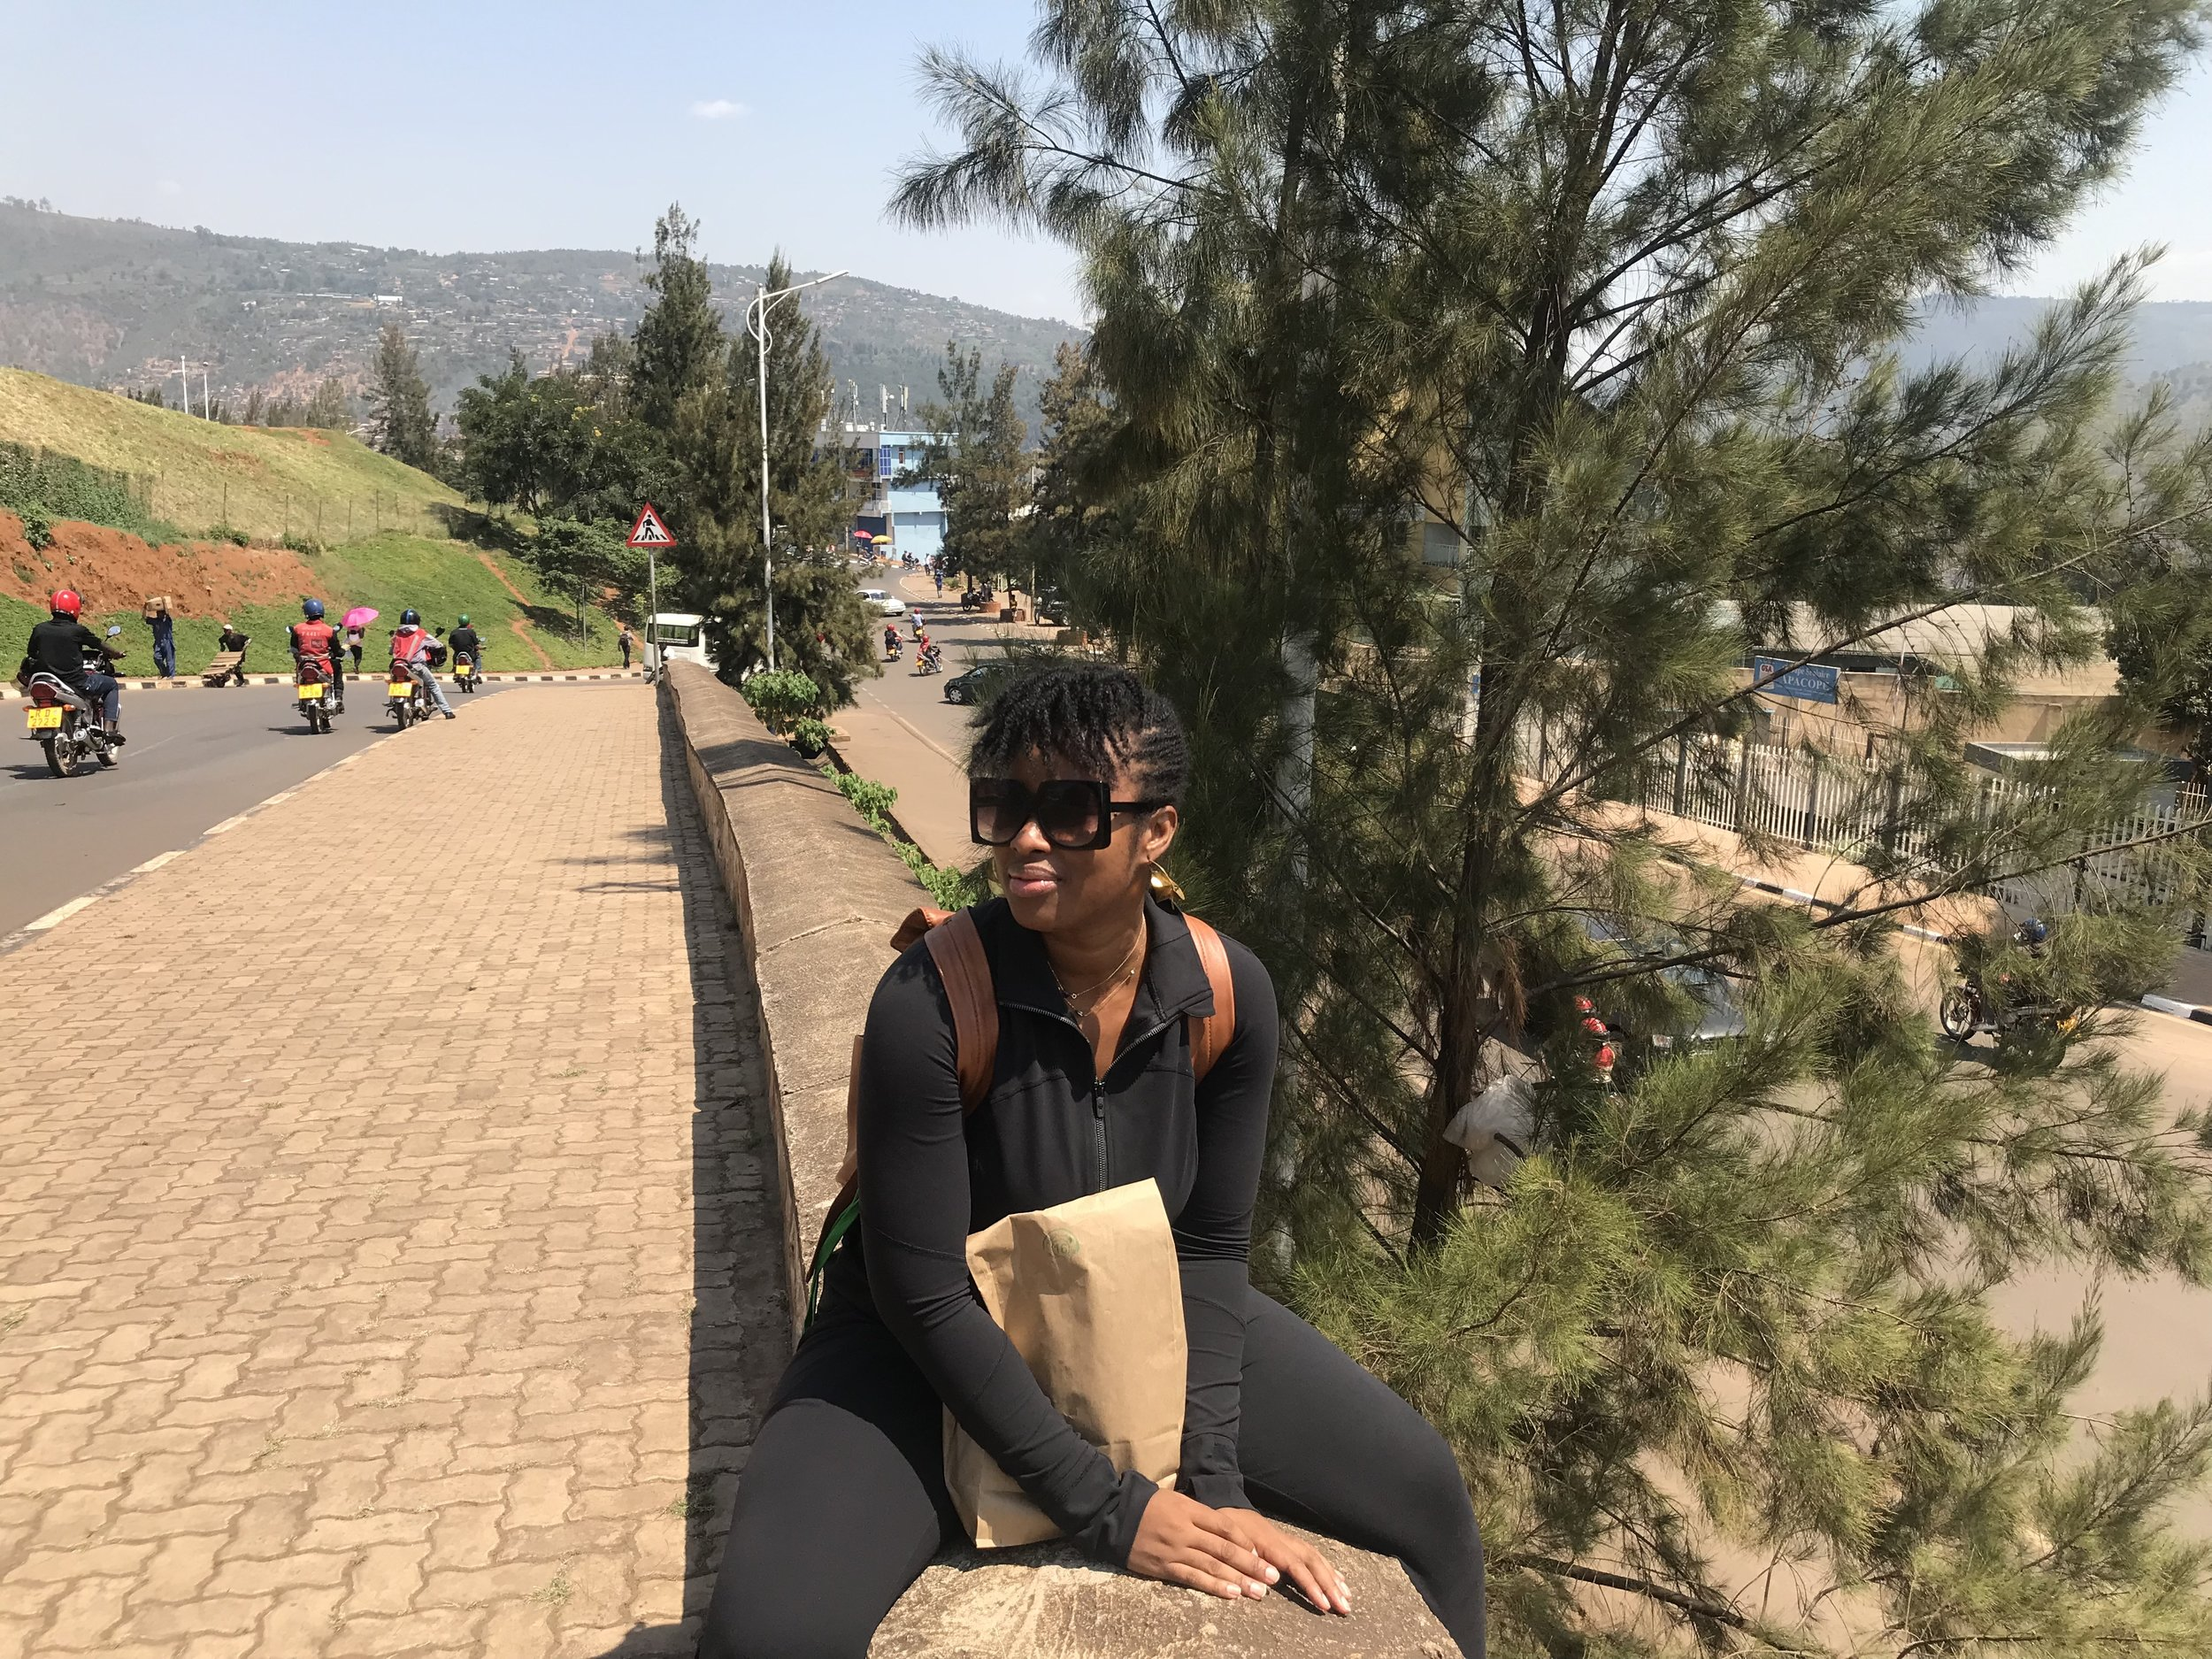 IMG_5634 2VickieRemoe-travel-kigali-rwanda-review-kwibohora25-hotels-africa.JPG